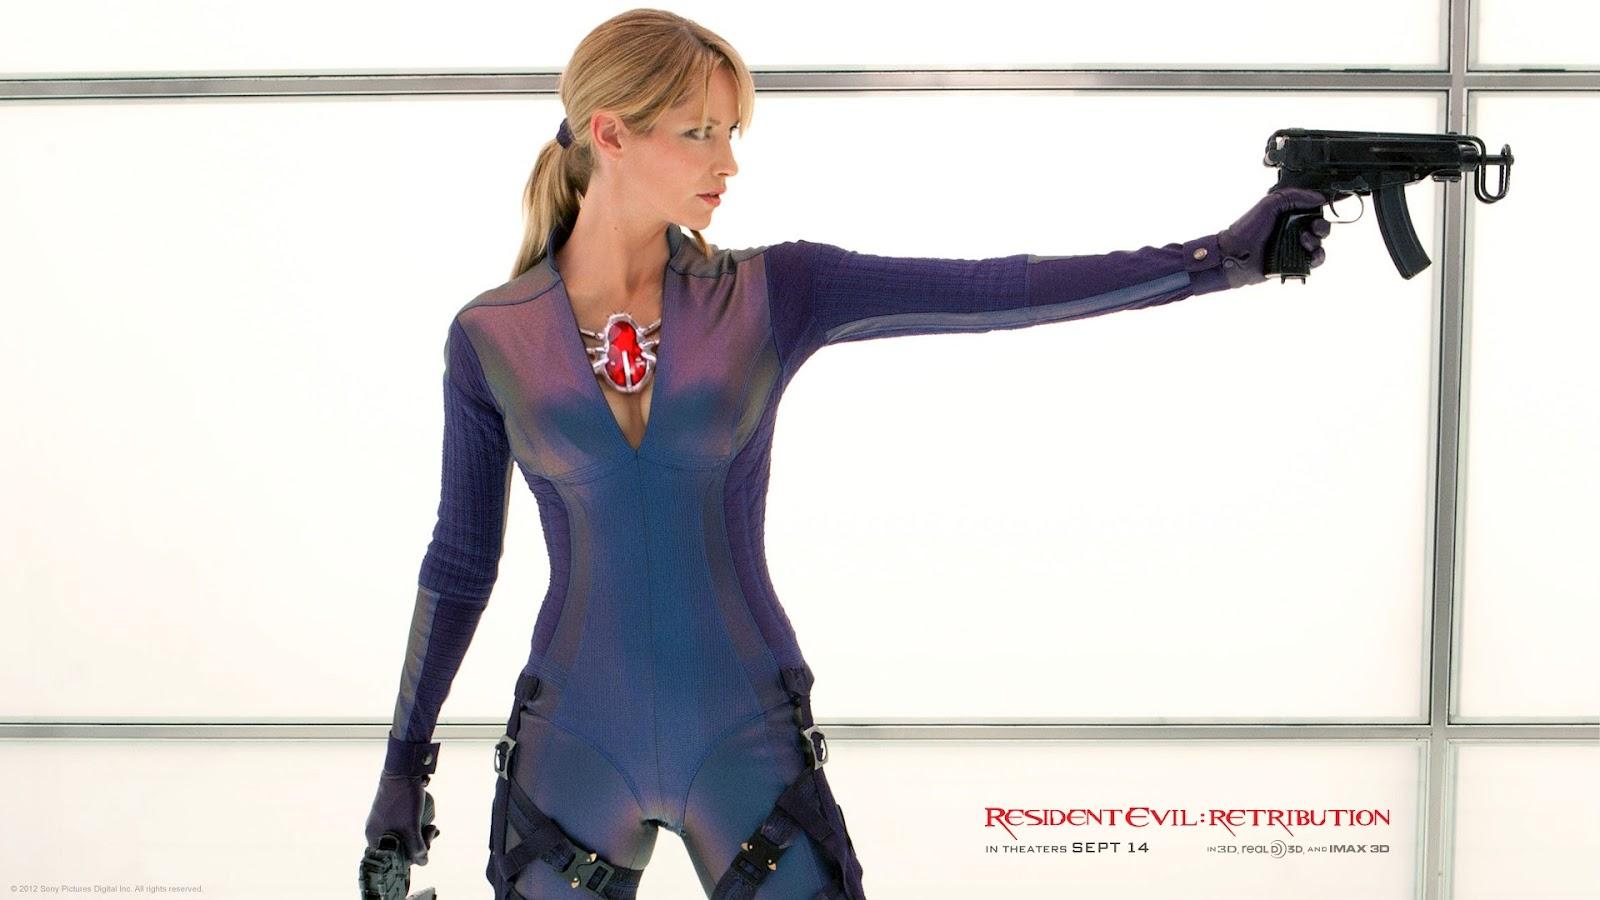 http://1.bp.blogspot.com/-gI8RWadauZU/UE4FiJO2ltI/AAAAAAAAEbU/cAAcIZLvYVc/s1600/Resident_Evil_Retribution_Jill_Valentine_HD_Wallpaper-Vvallpaper.Net.jpg